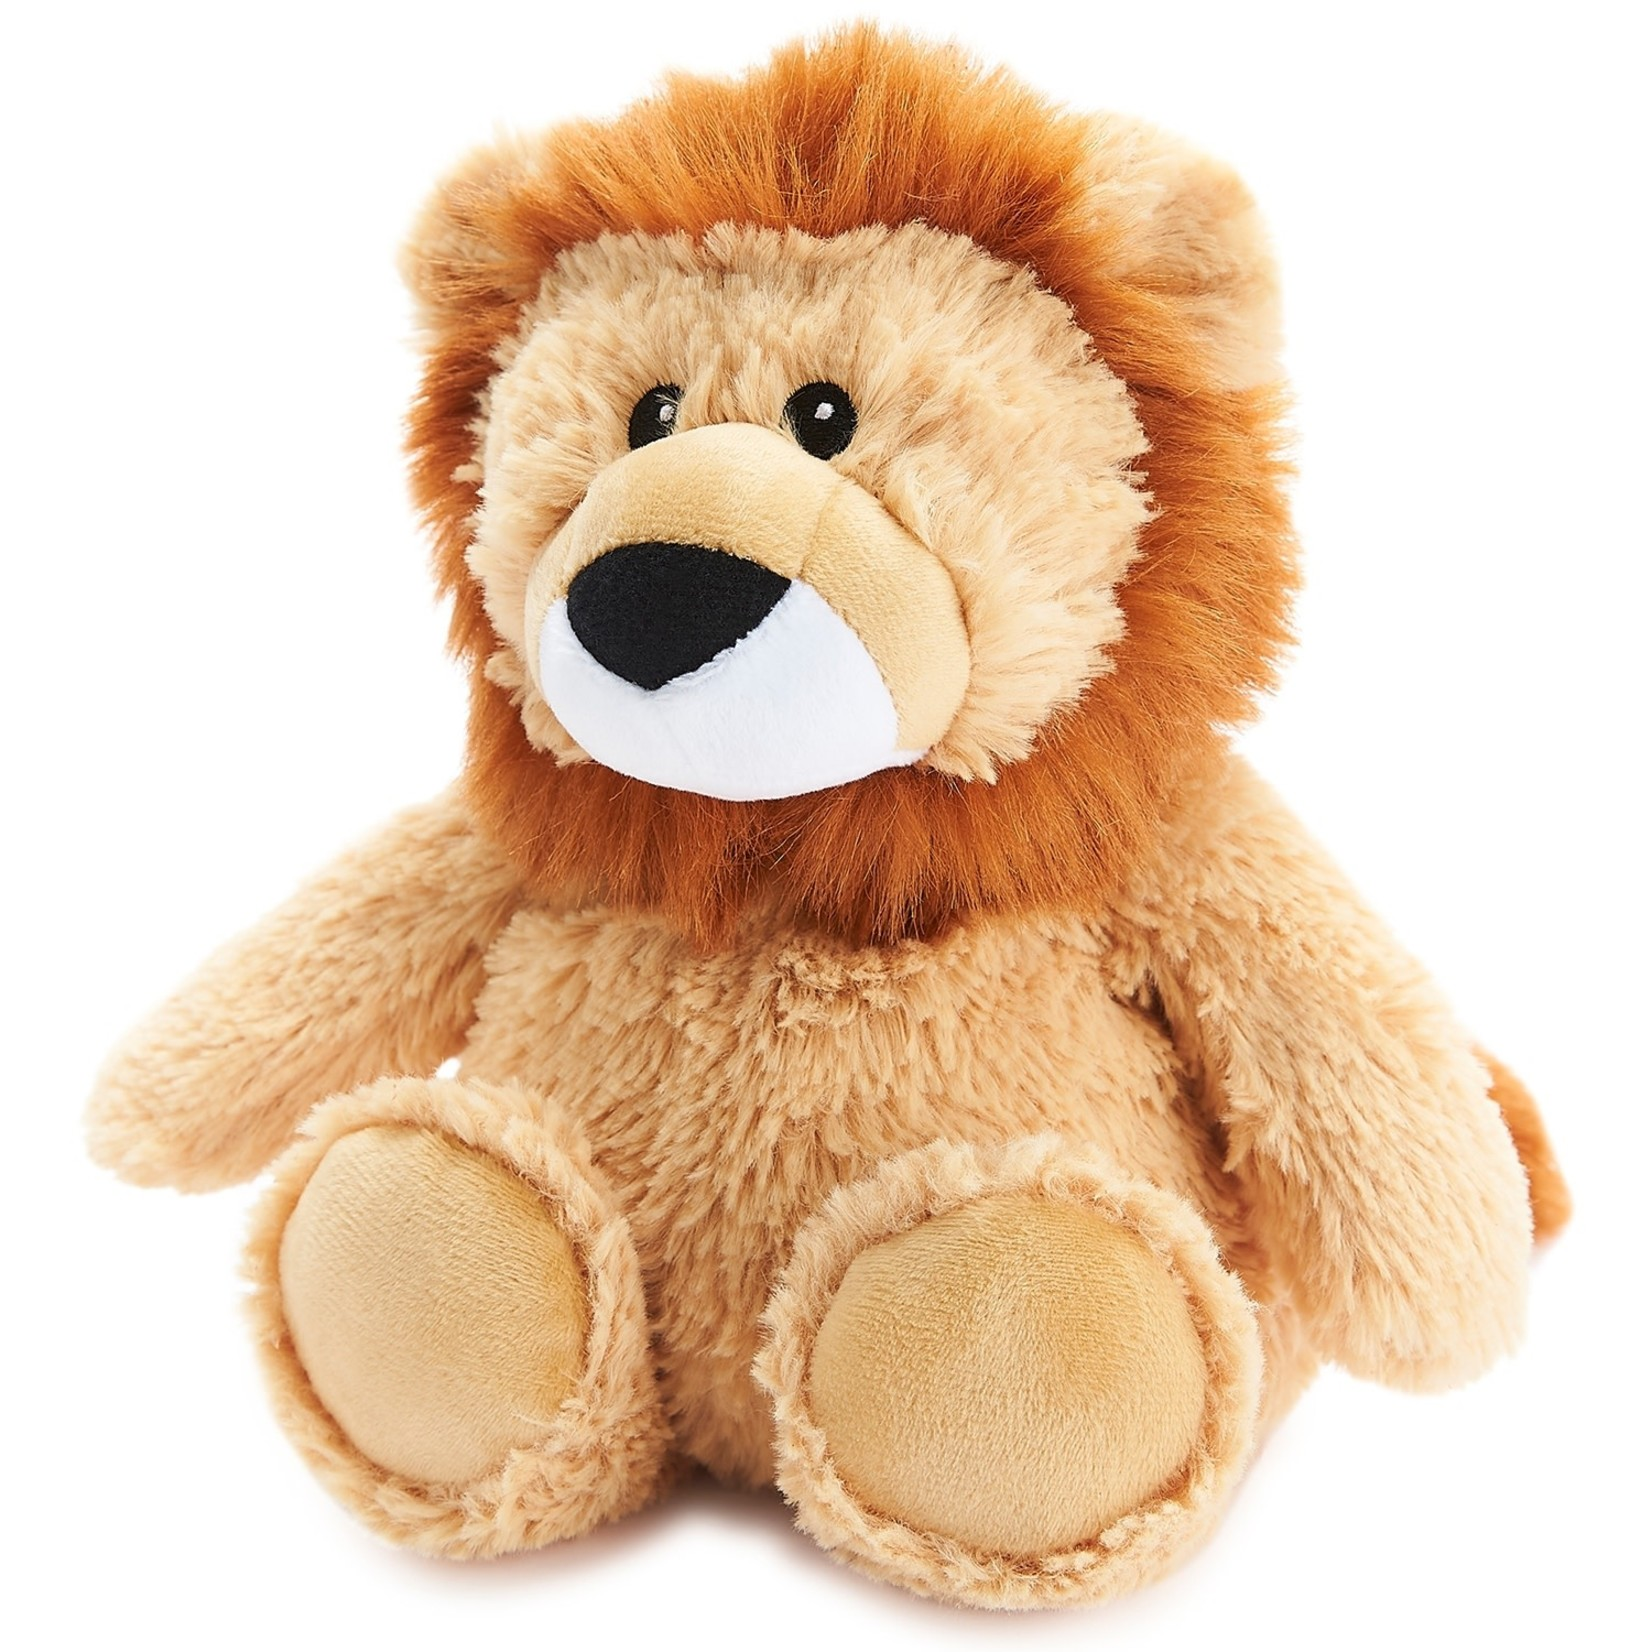 Intelex Big Lion Cozy Plush